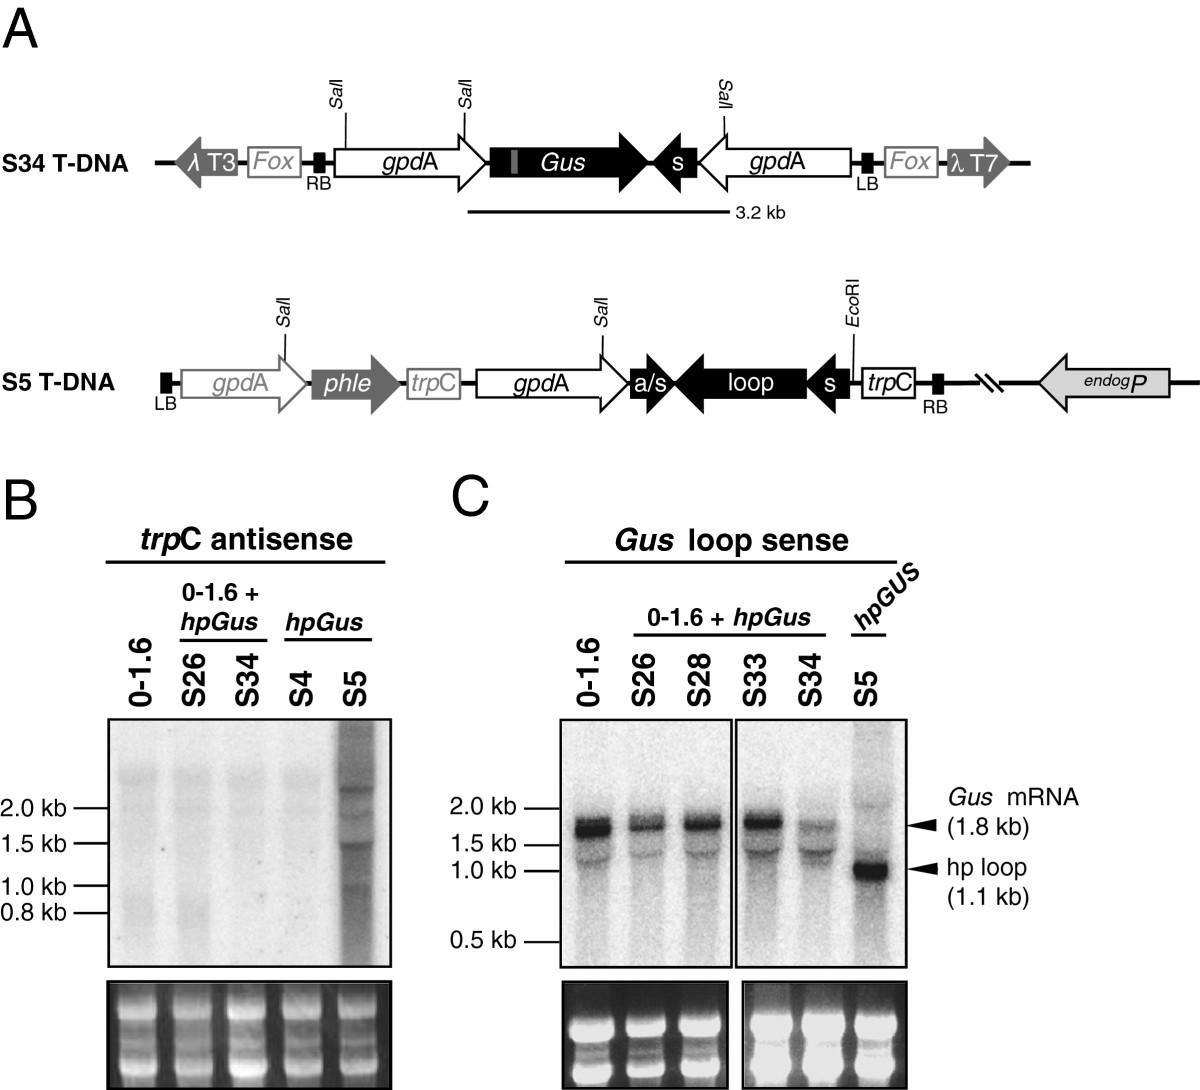 analysis of hairpin rna transgene induced gene silencing in fusarium Palindromic Hairpin RNA open image in new window